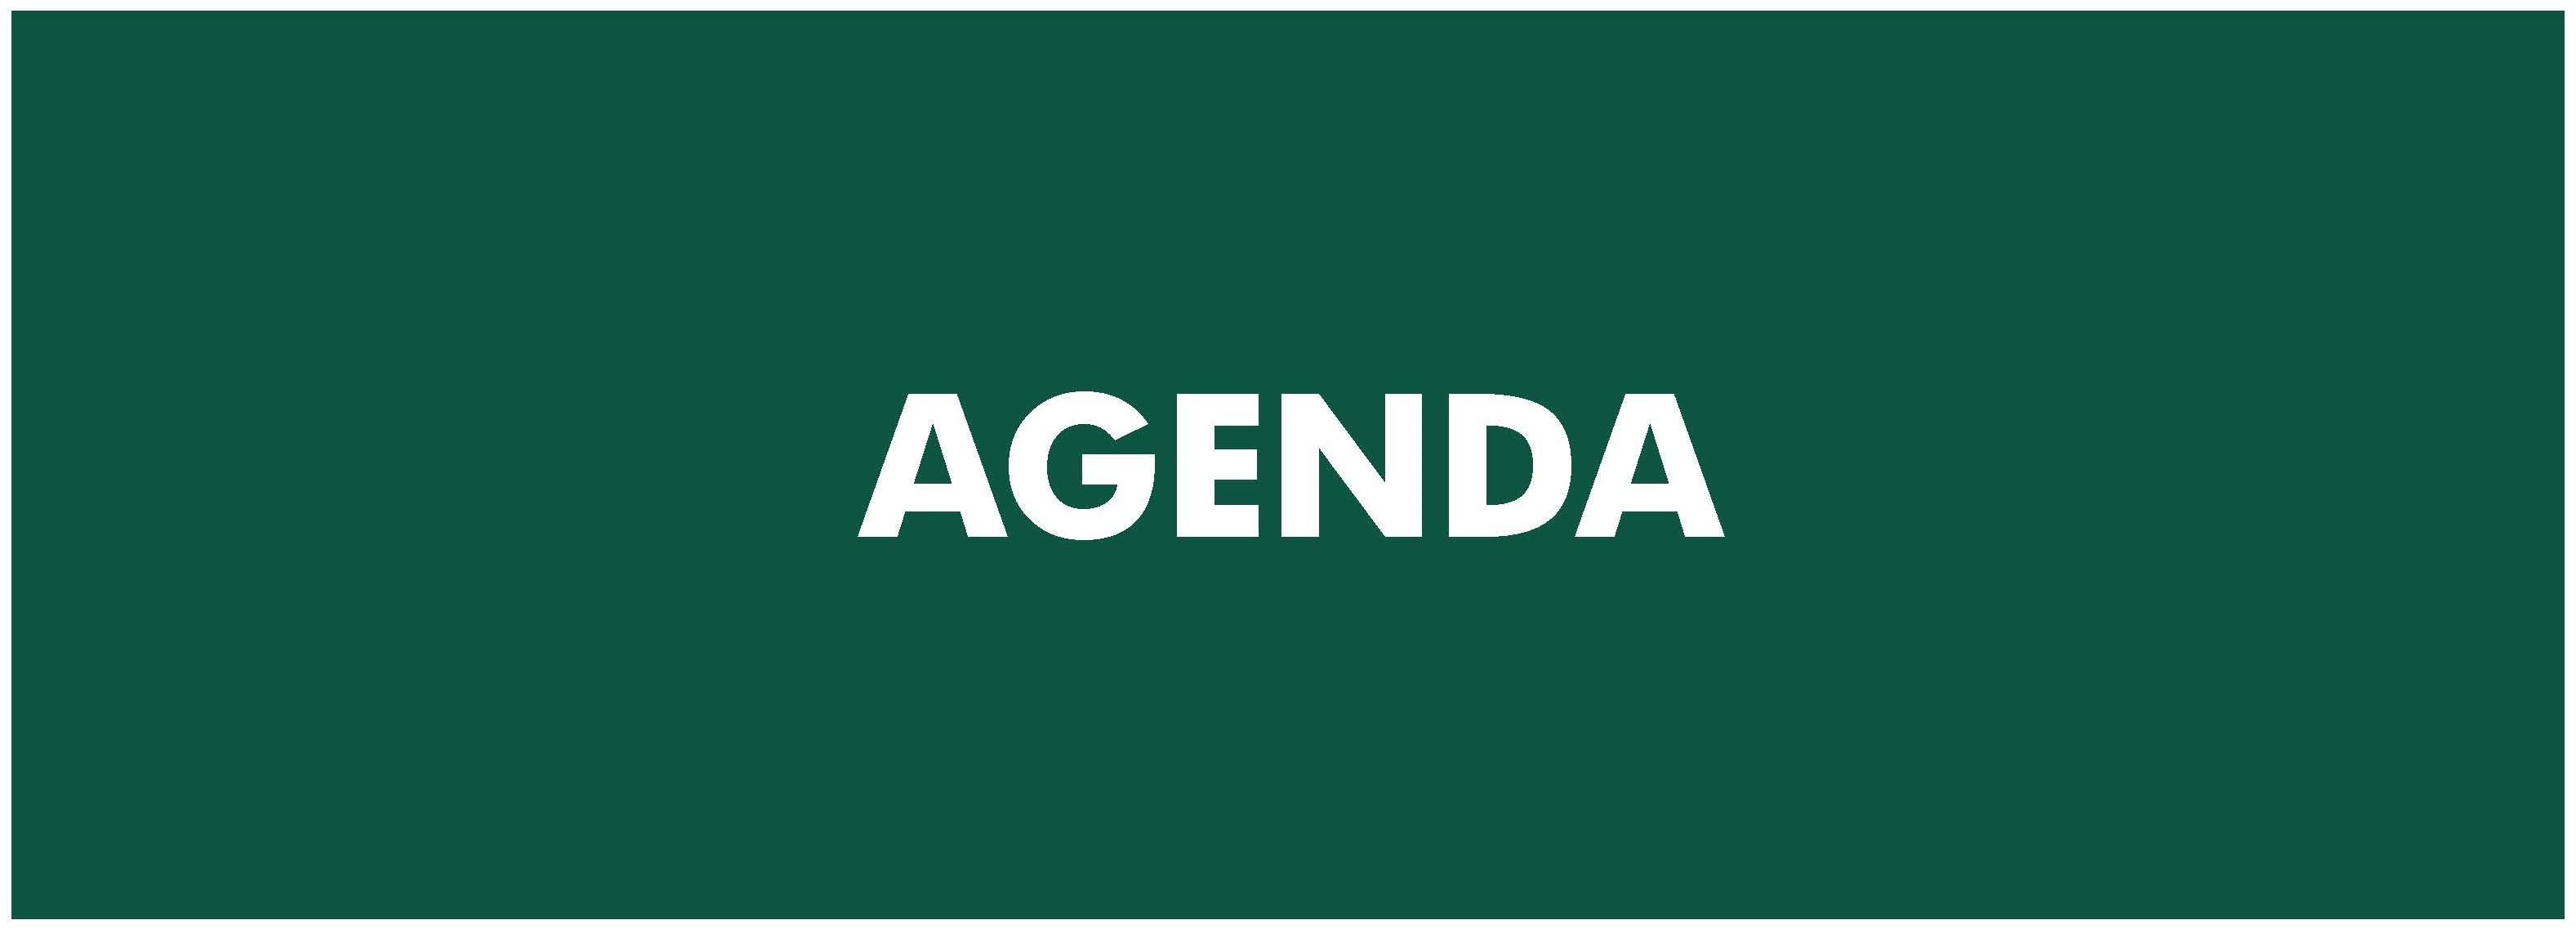 NAGDCA_Annual_CventWebsite_agenda_cropped